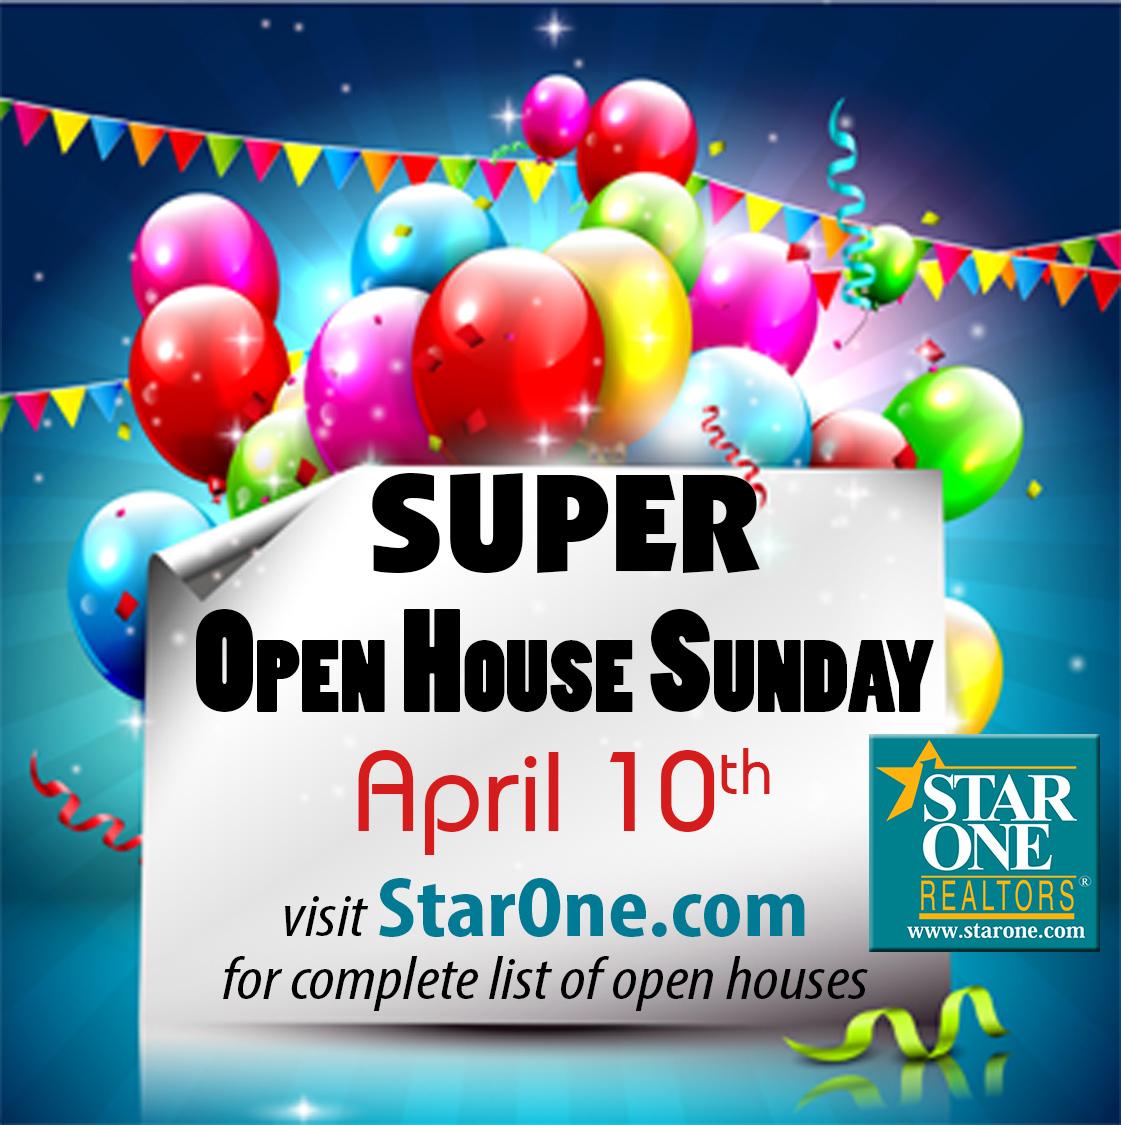 Star One Realtors Star One Realtors 39 Are Holding Super